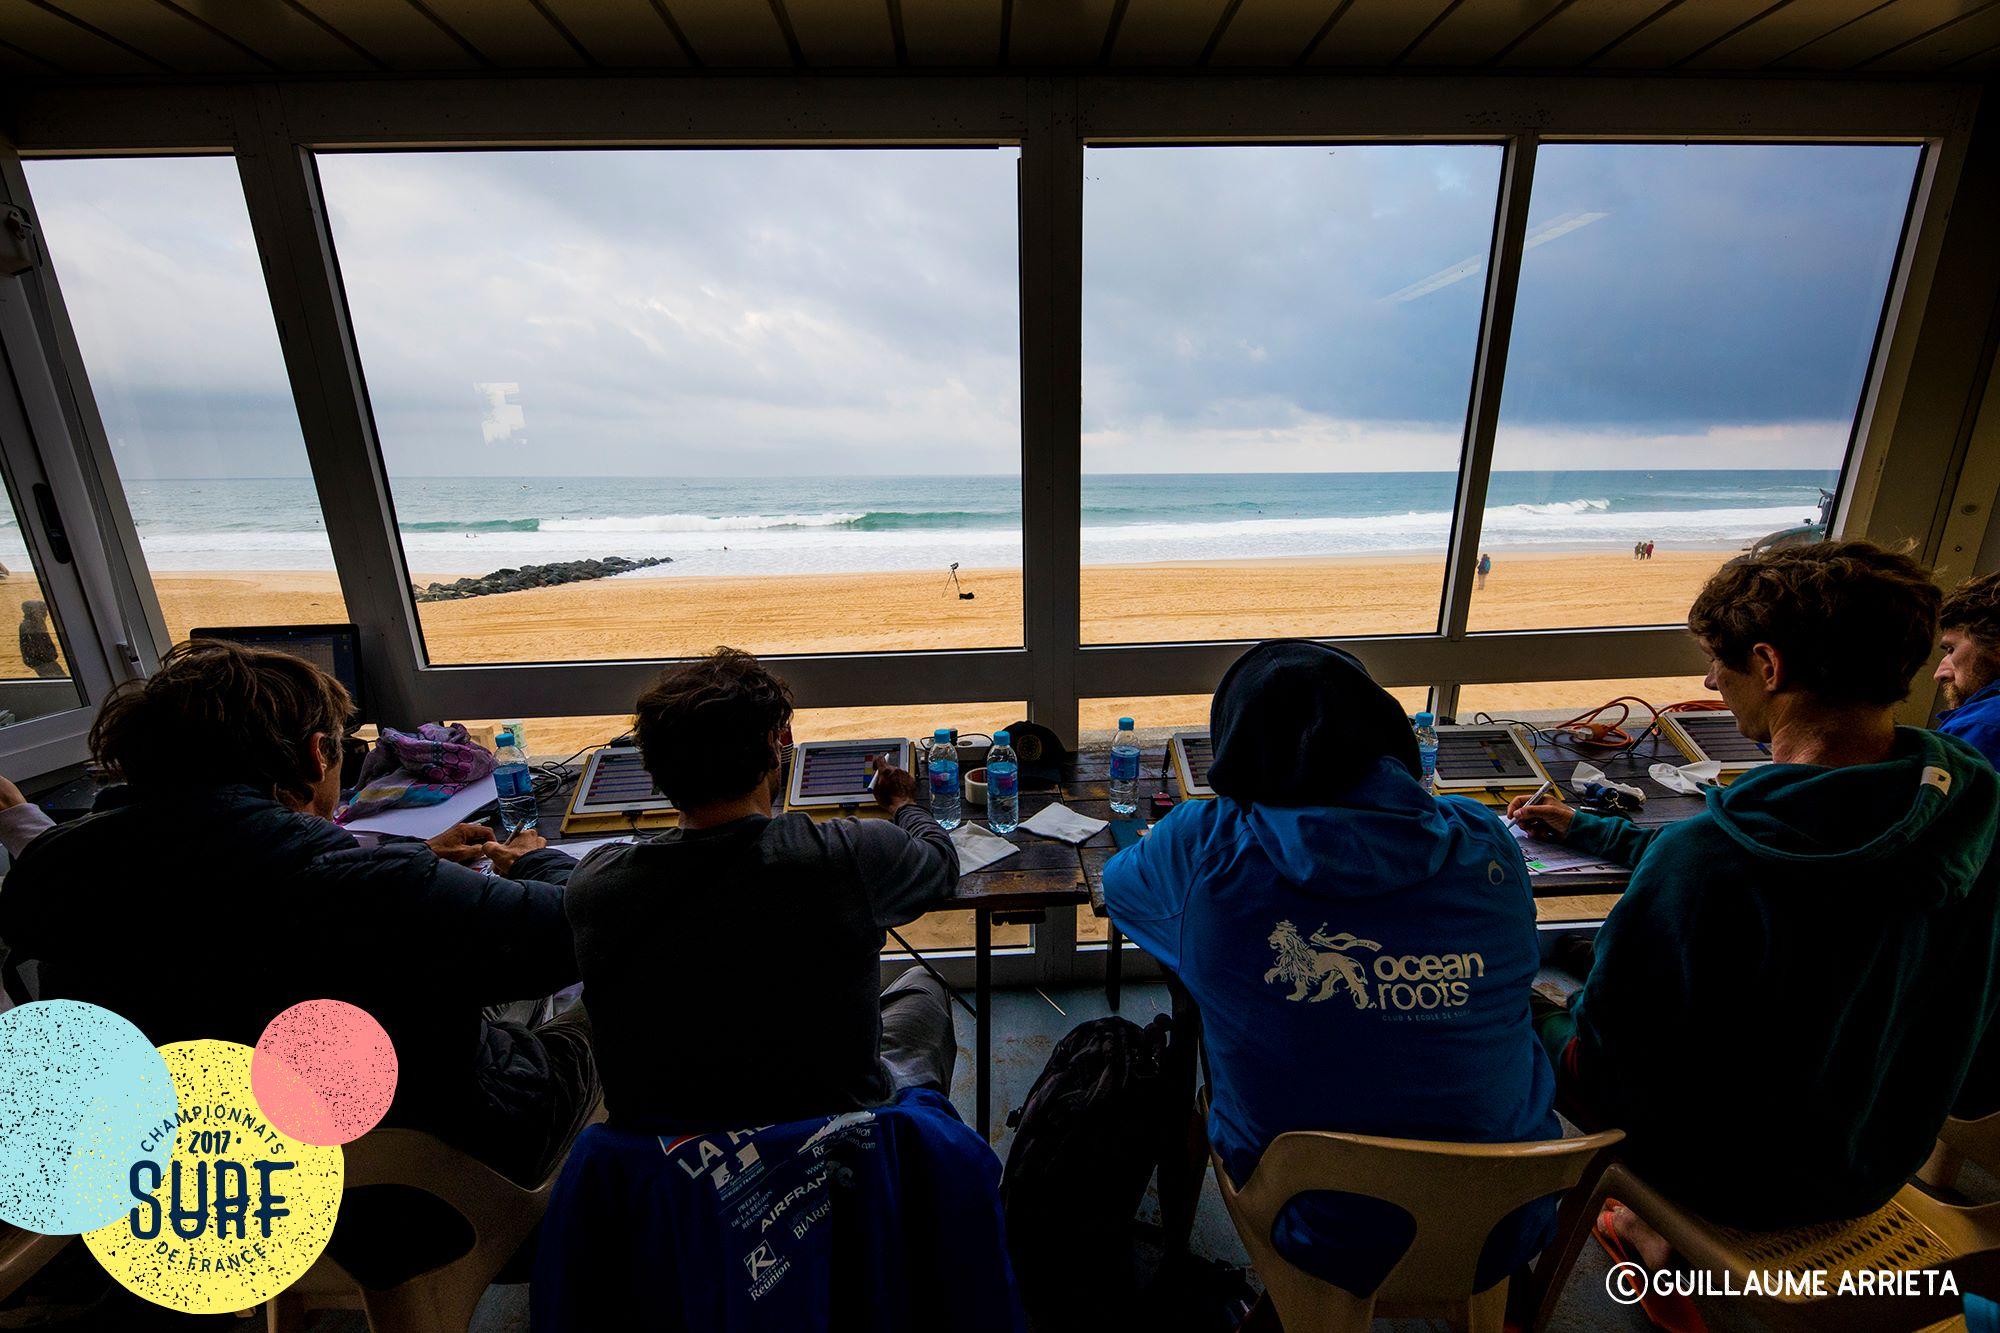 https://www.ligue-bretagne-surf.bzh/wp-content/uploads/2018/01/FFS-ChampFRANCE-Hossegor-2017-bodyboard-1.jpg